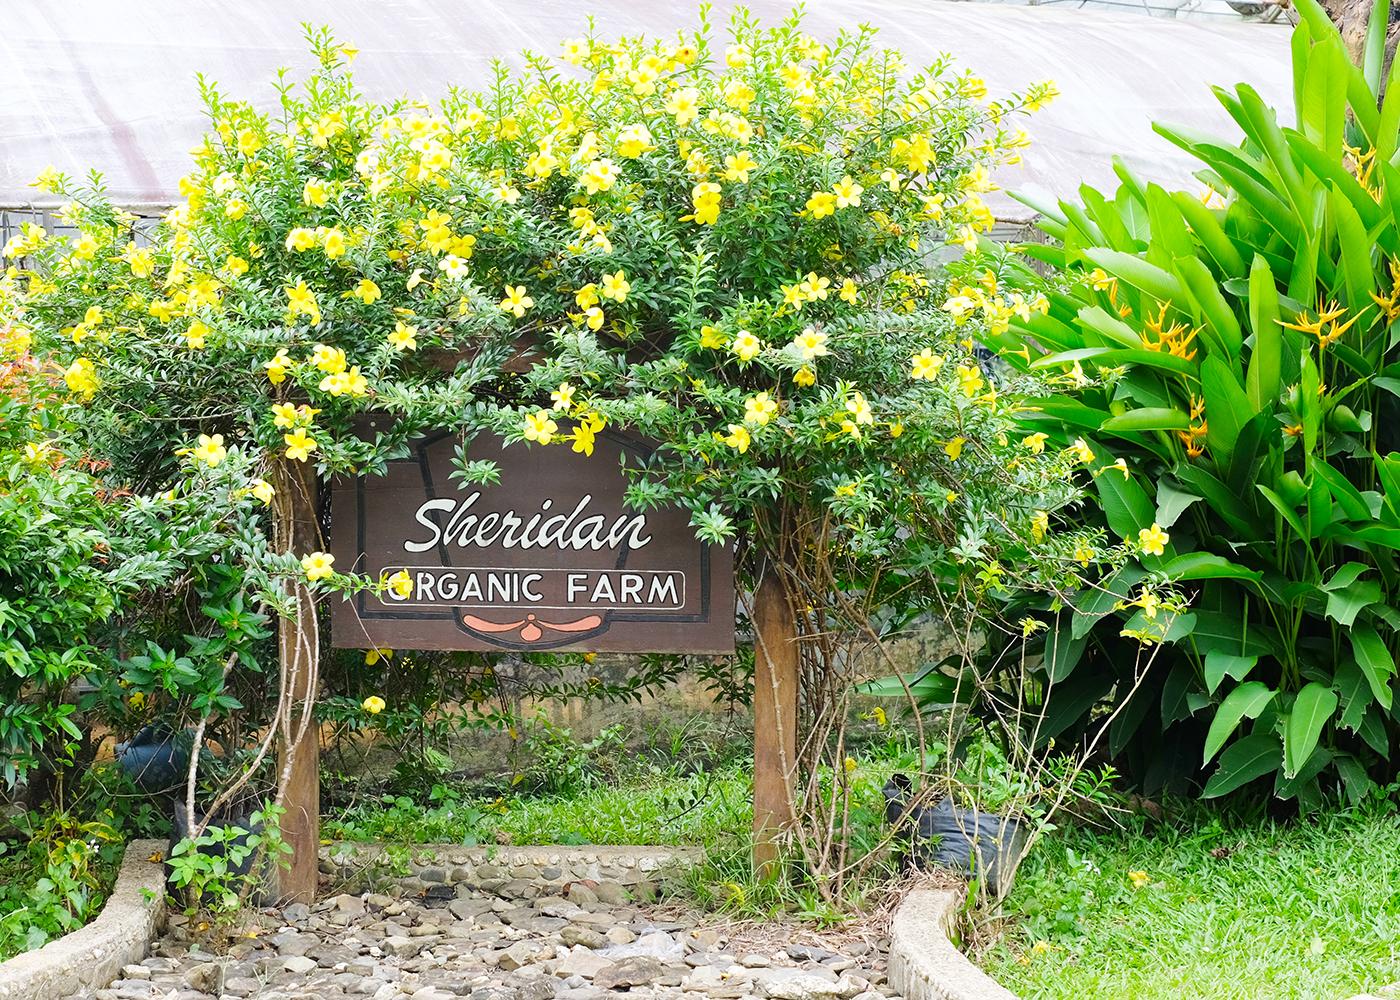 5a815e290edf8-sheridan_resort_sabang_undergr